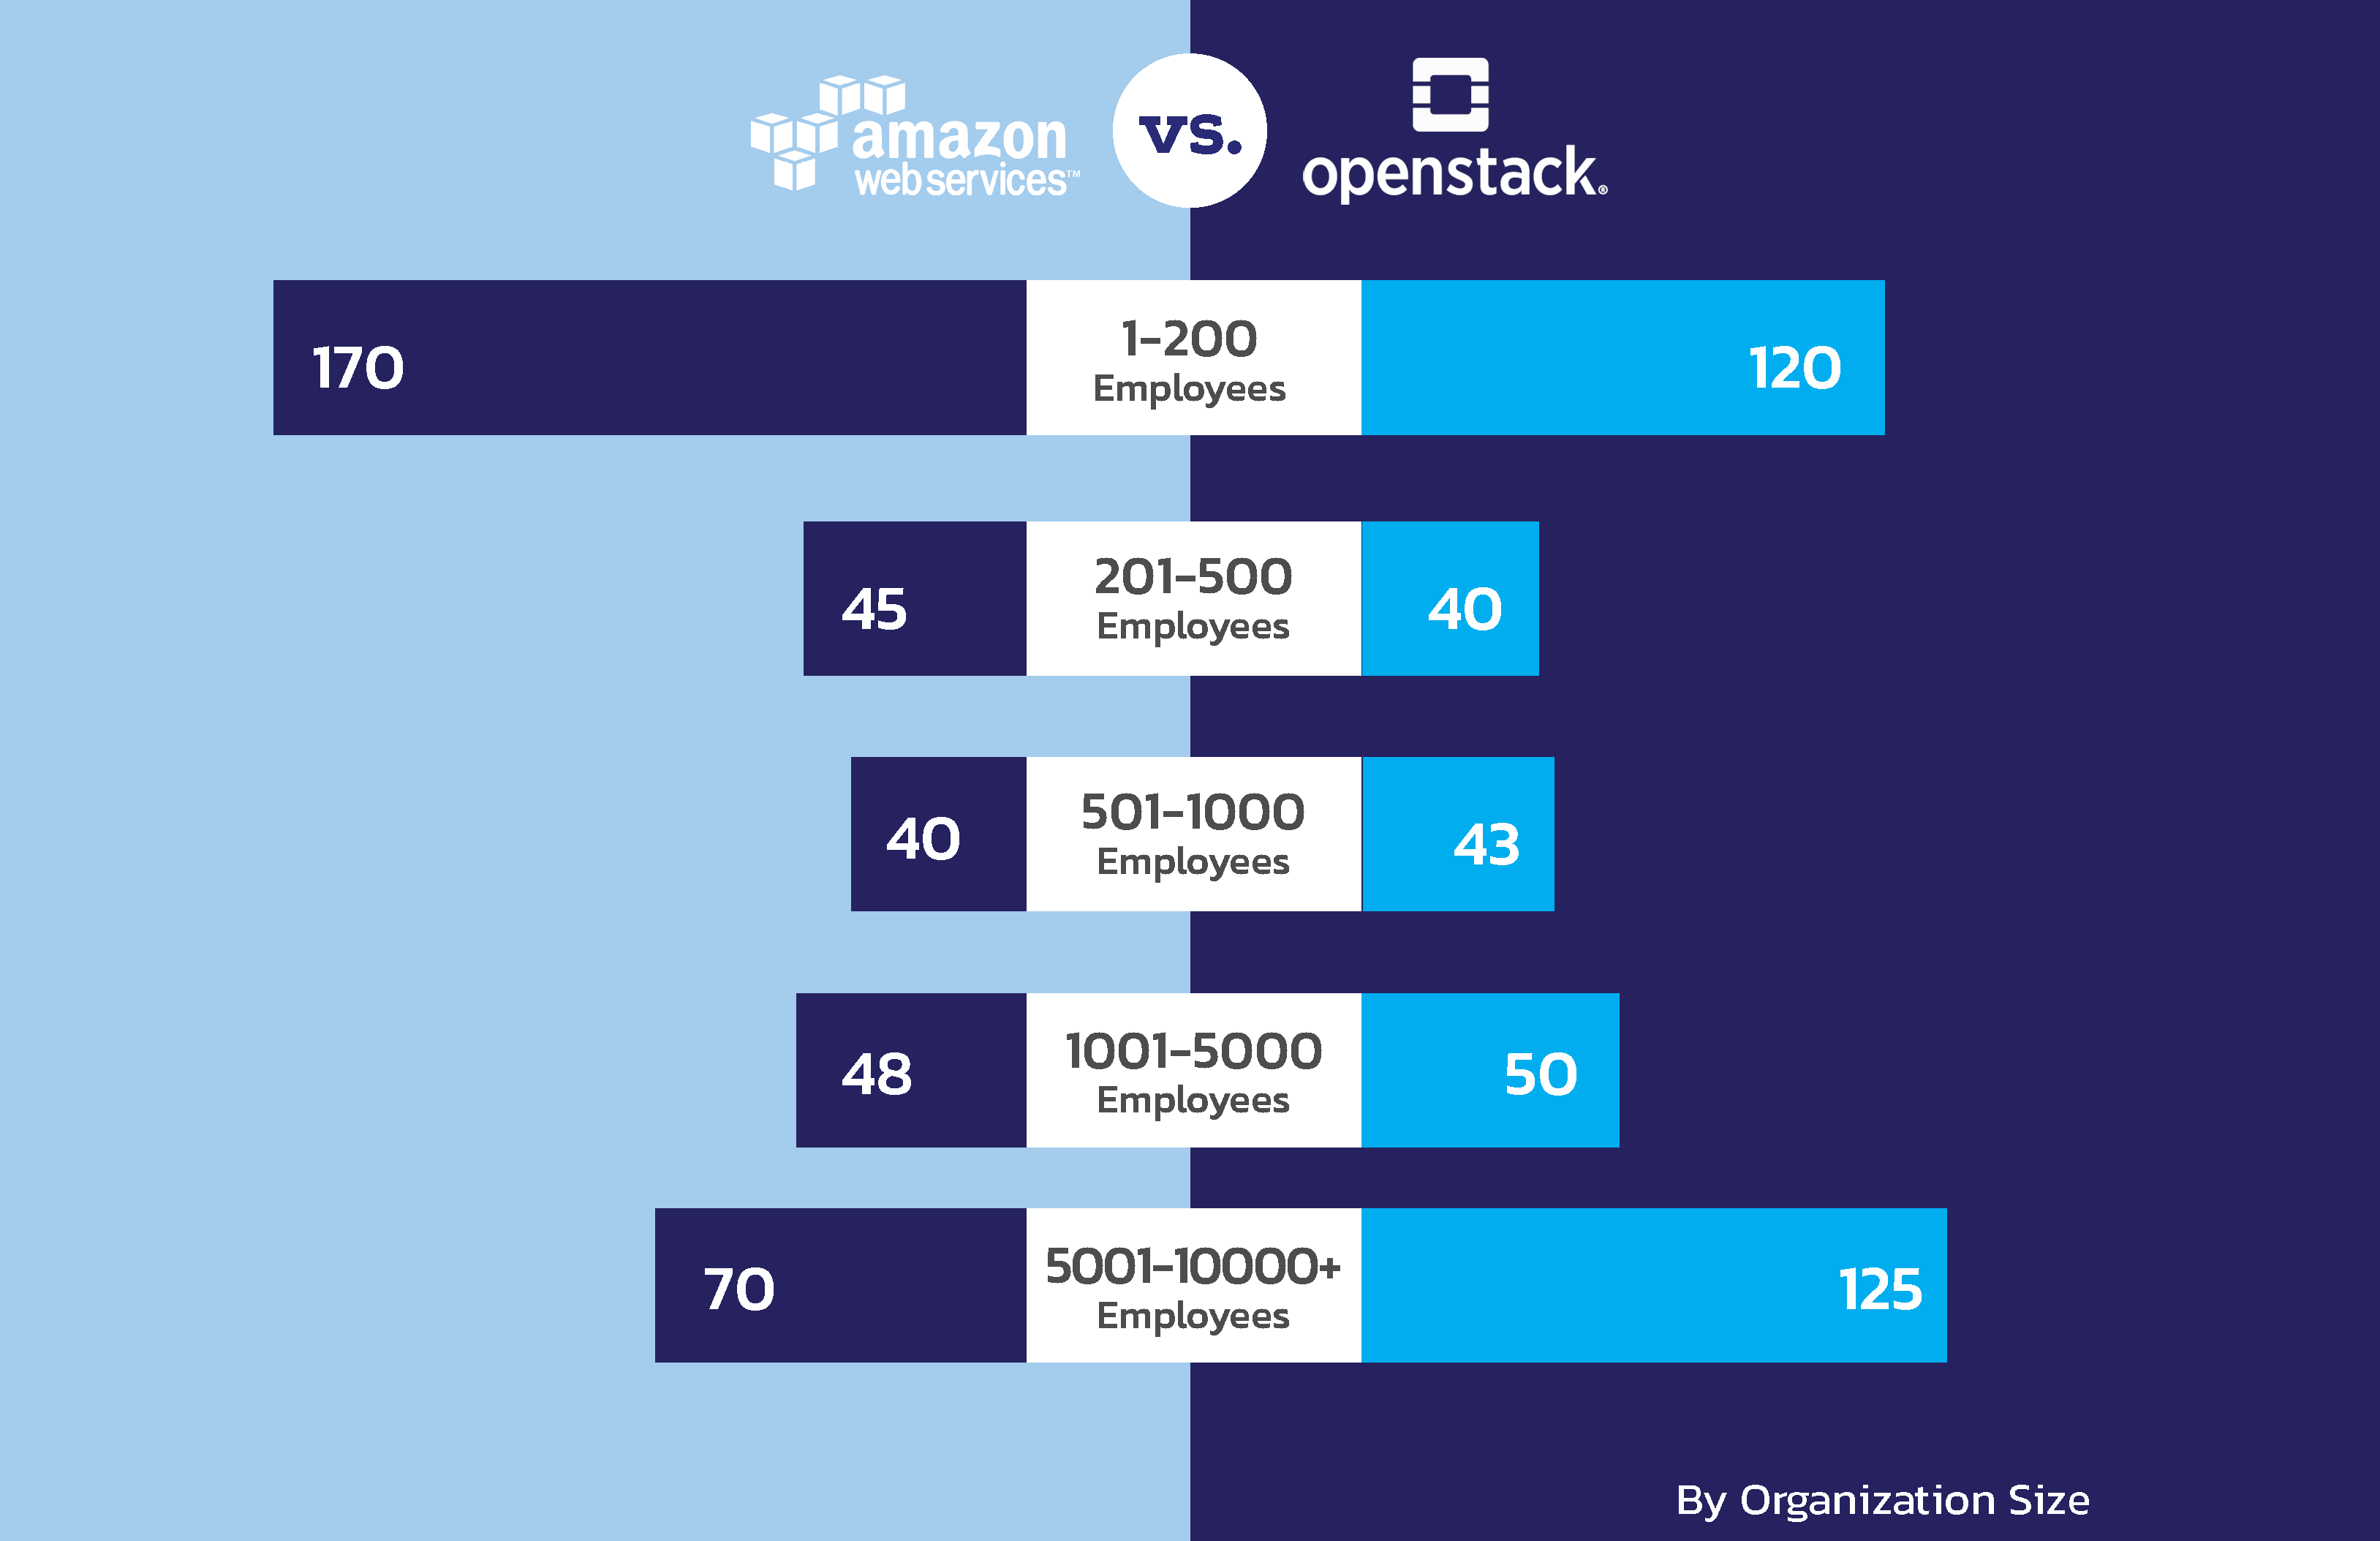 amazon vs openstack